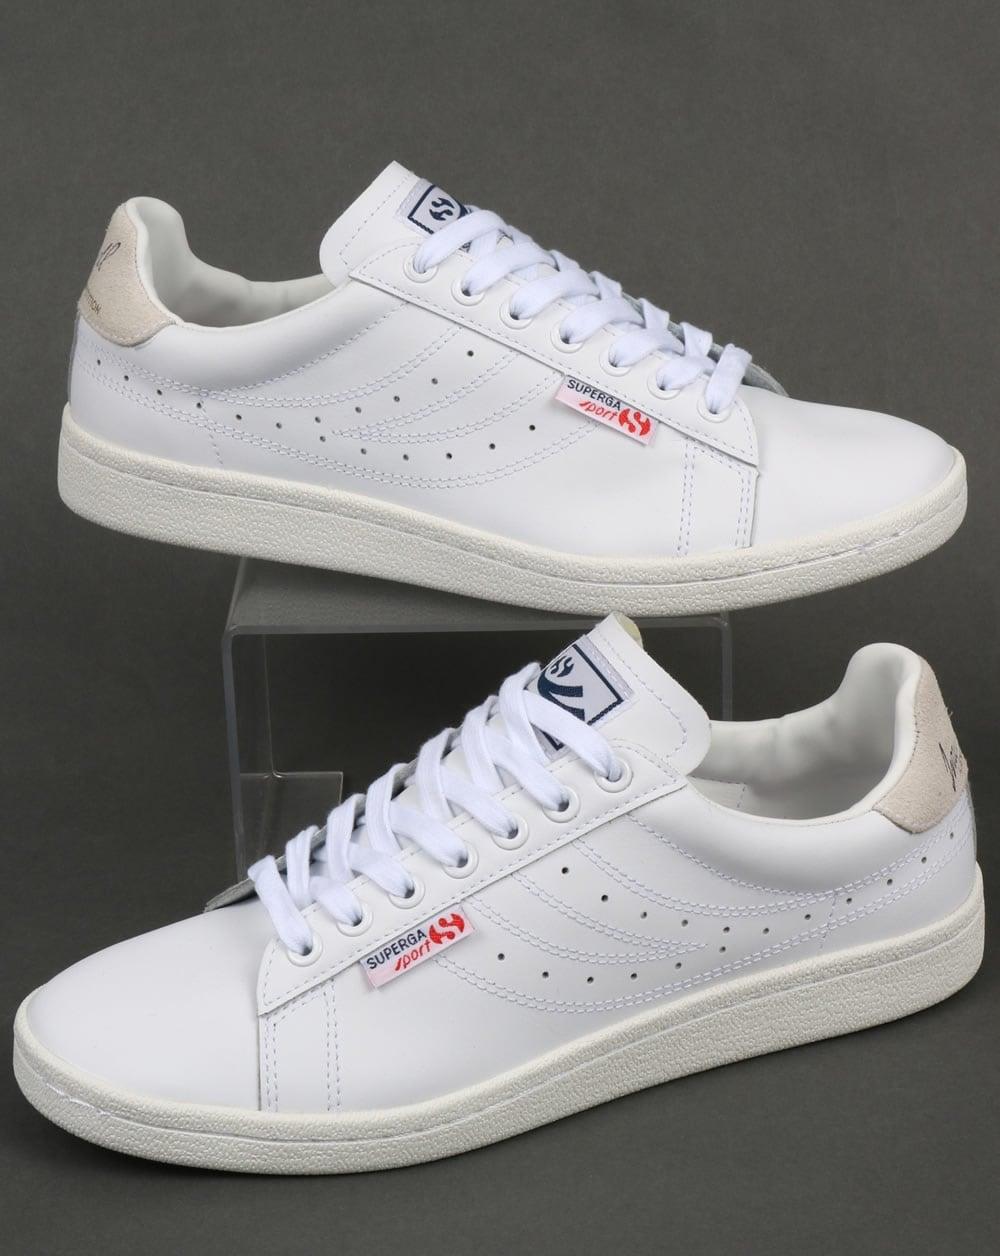 Superga Lendl 4832 Trainers White,sport